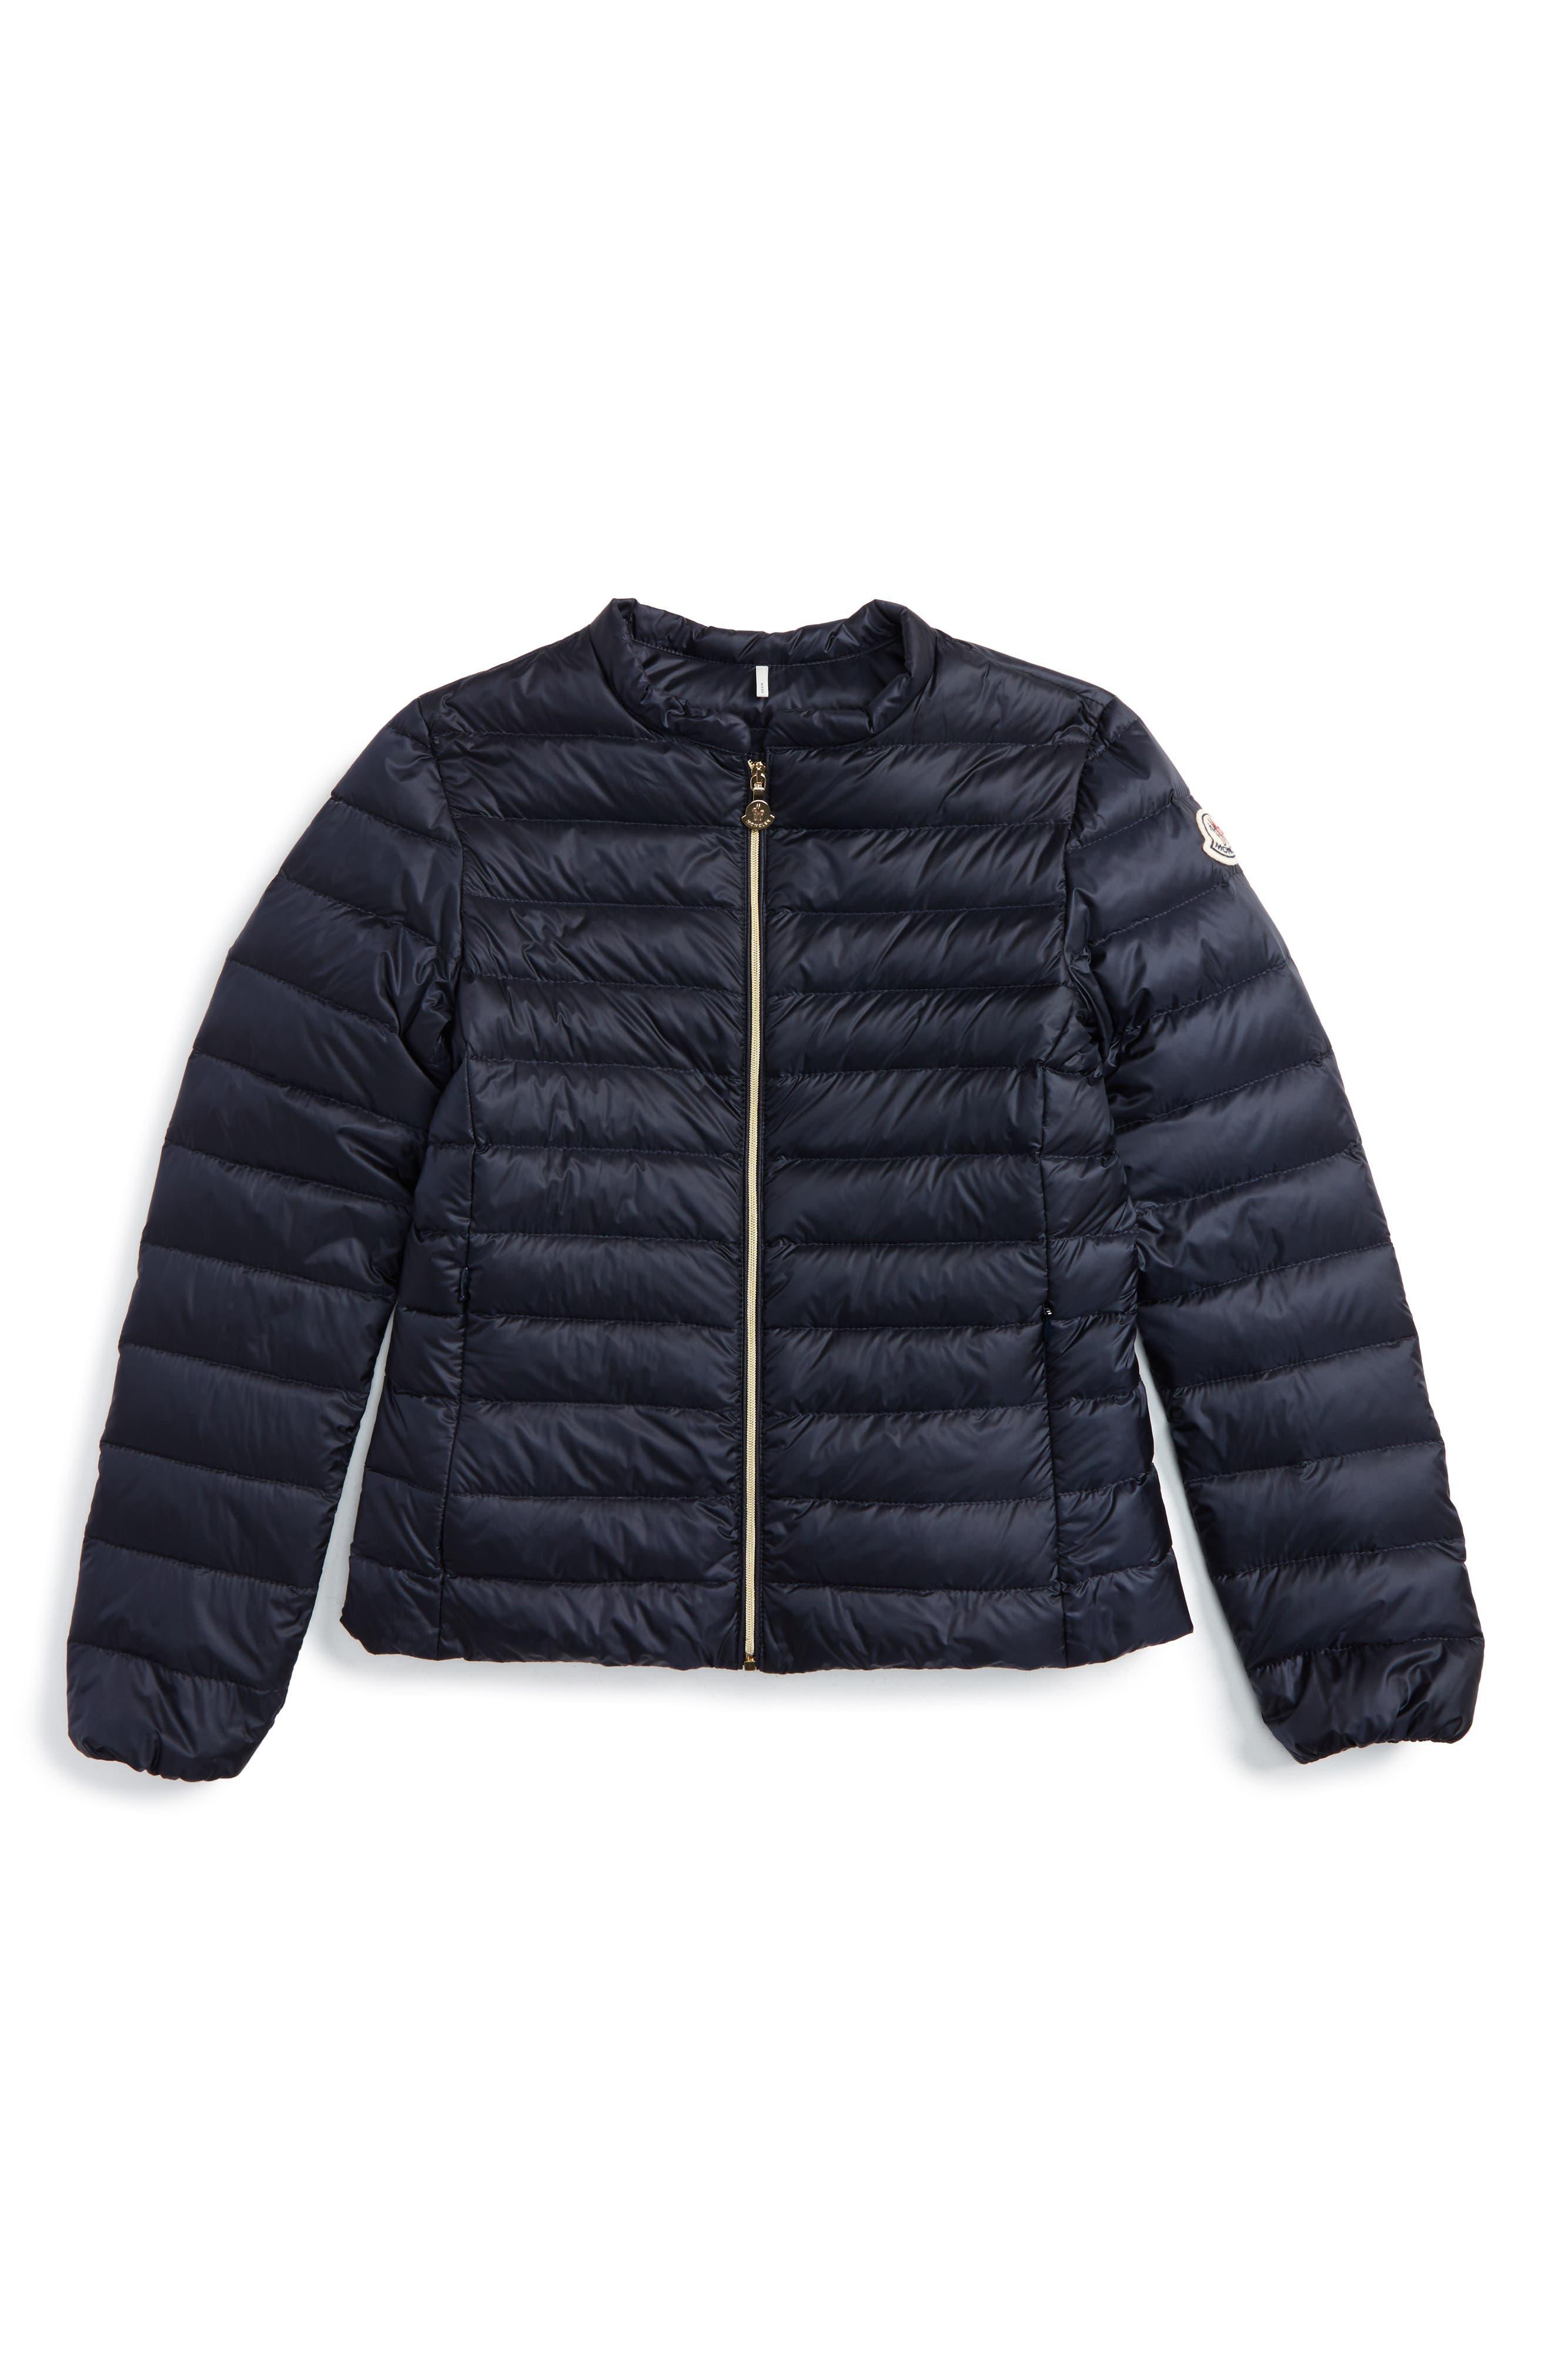 Ambrine Water Resistant Down Jacket,                             Main thumbnail 1, color,                             Navy